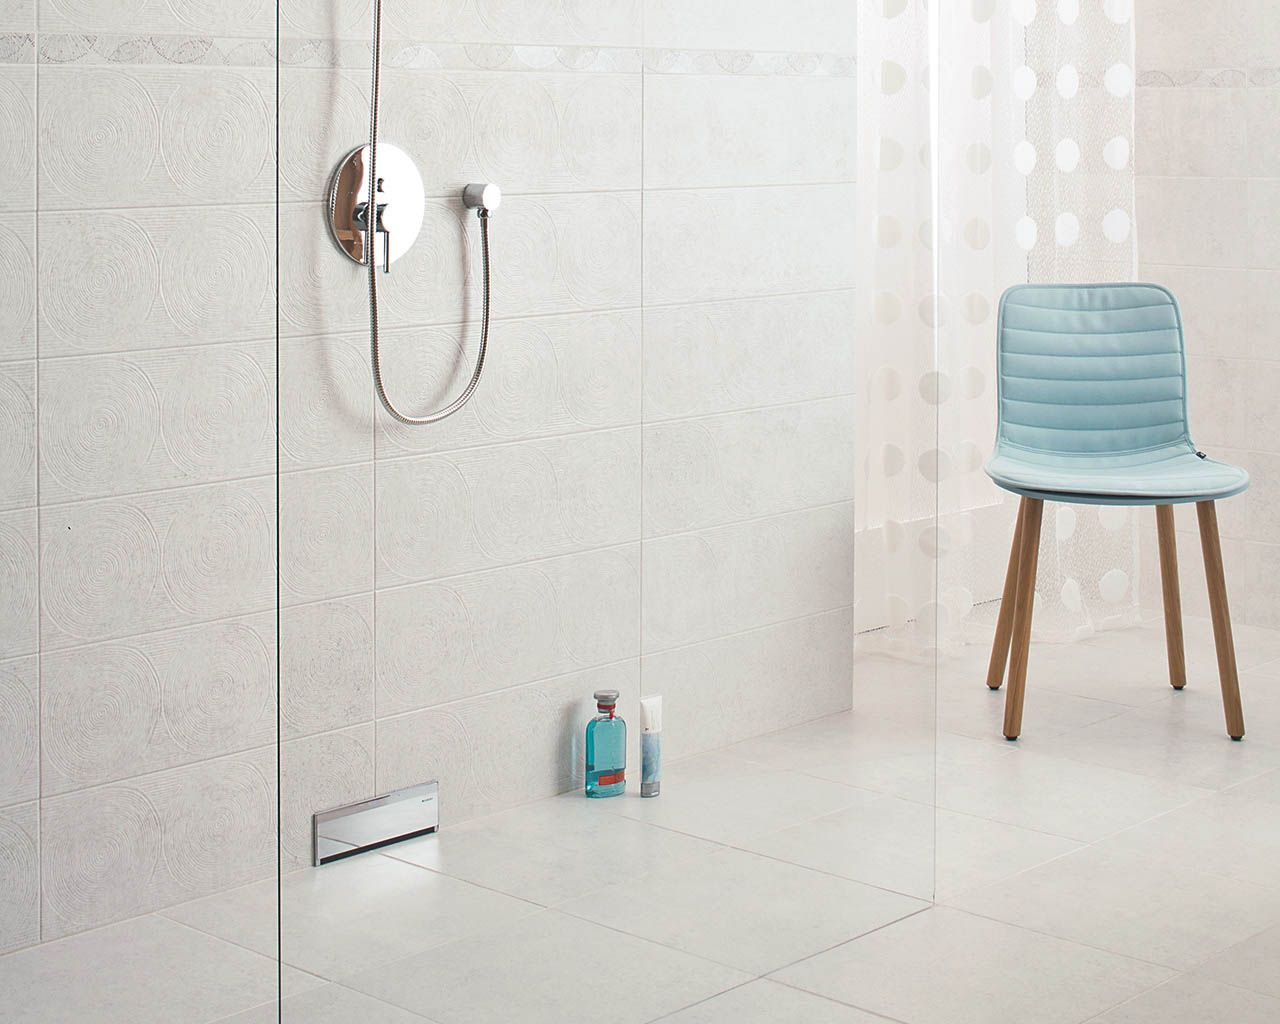 Nirrad / Niro - Bathroom tiles 20x60 cm in white and gray | Ceramika ...